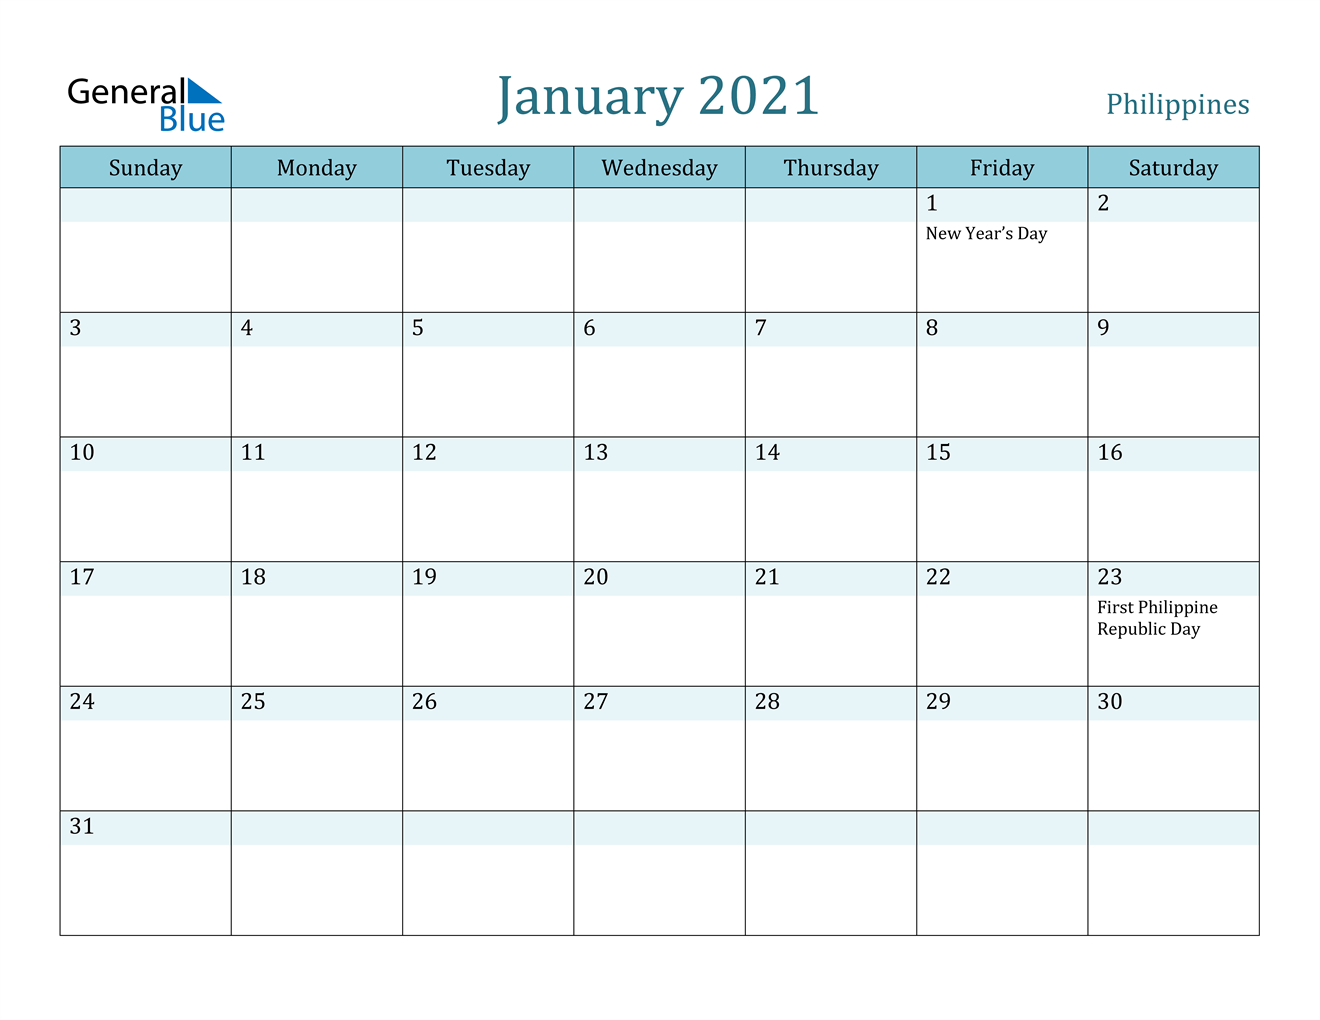 January 2021 Calendar Philippines